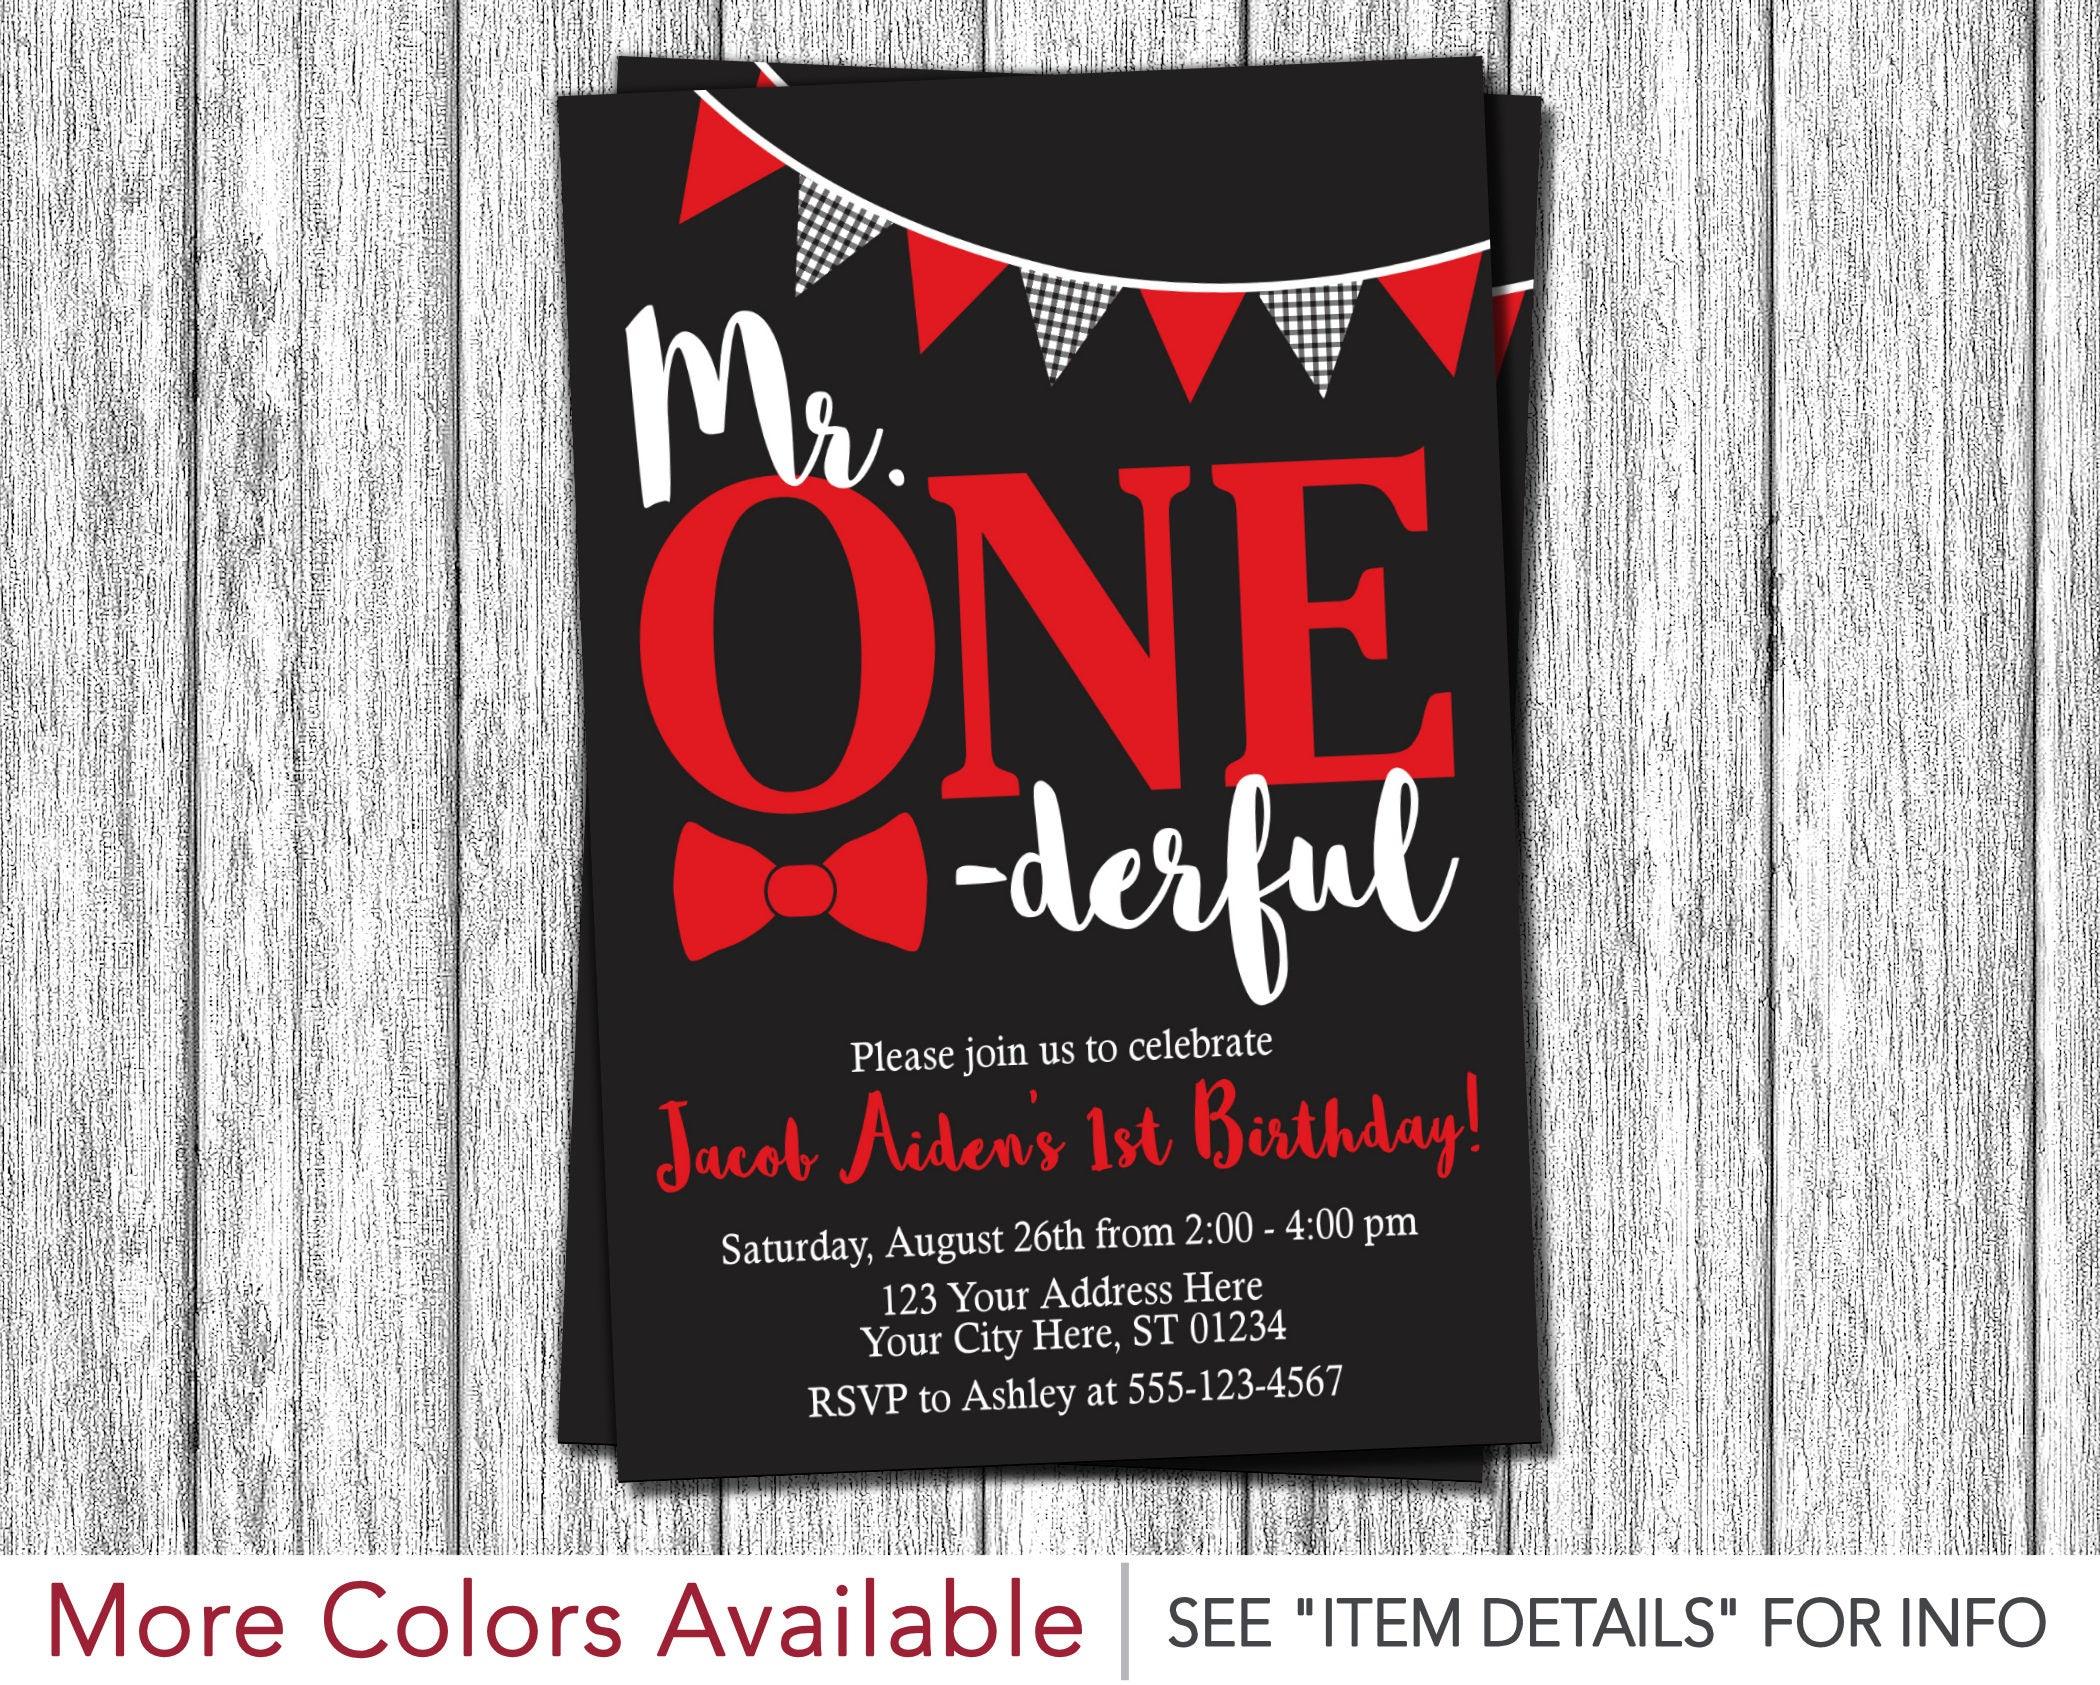 Mr. ONEderful Birthday Invitation Mr One-derful First | Etsy